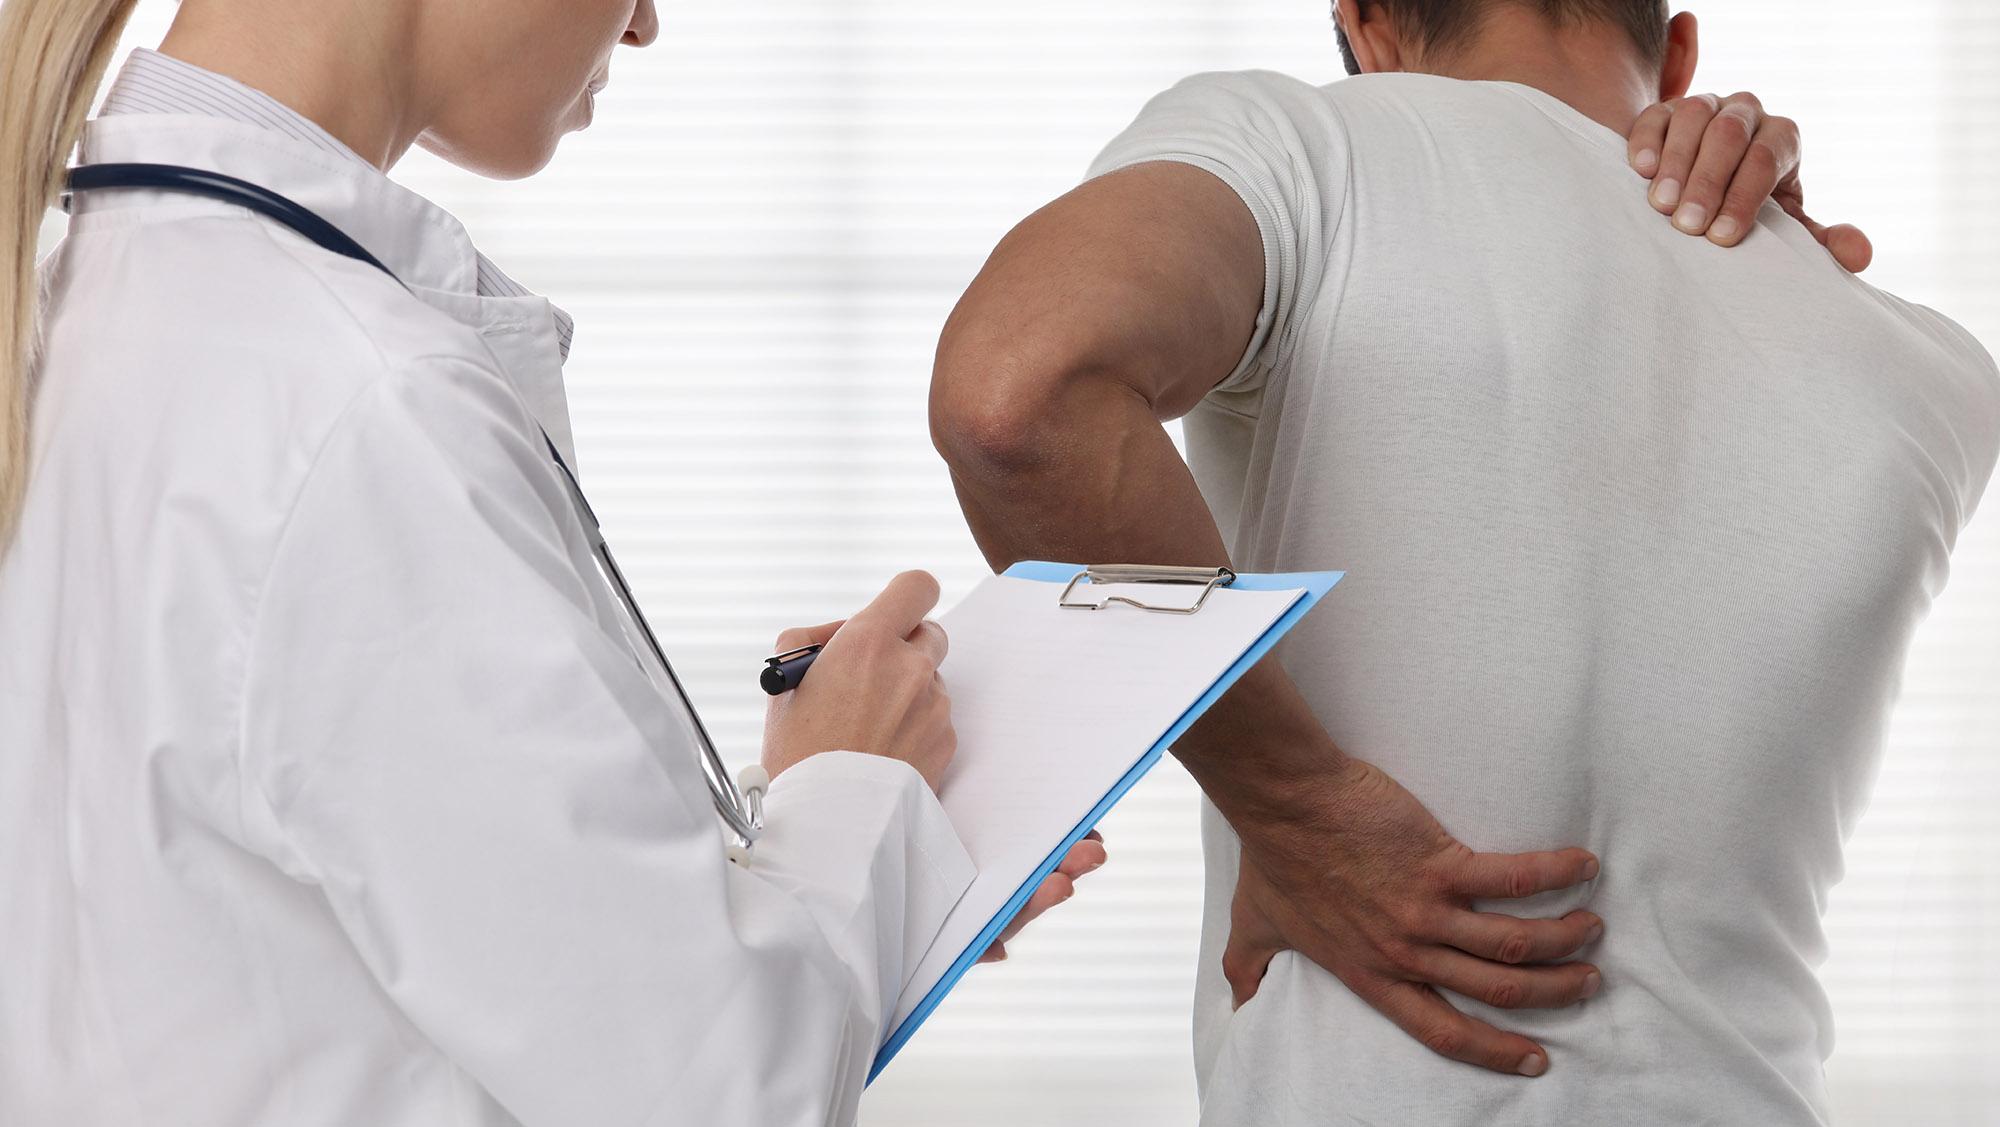 injured spine, back injury, doctor physio